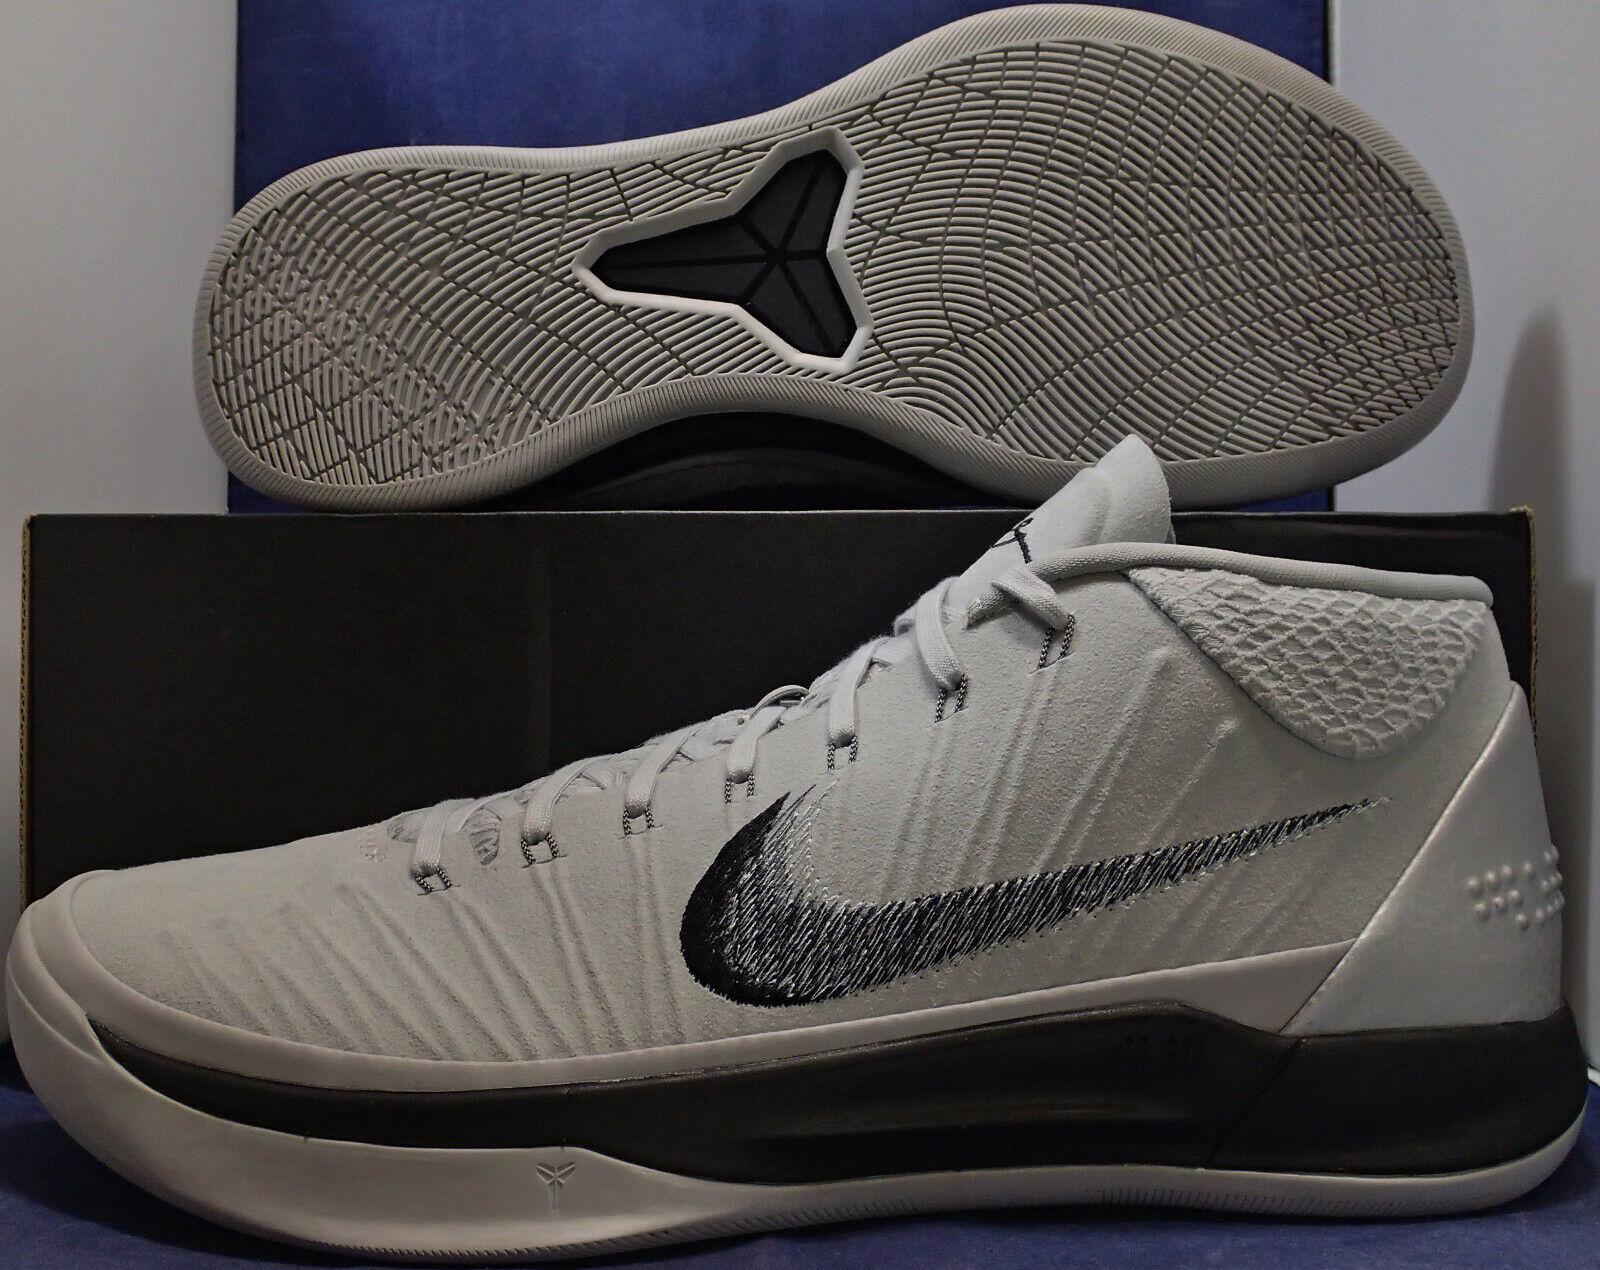 Nike Kobe a.D.Identifikation Silbergrau Schwarz Größe 13 (Ao4789-991)    | Abgabepreis